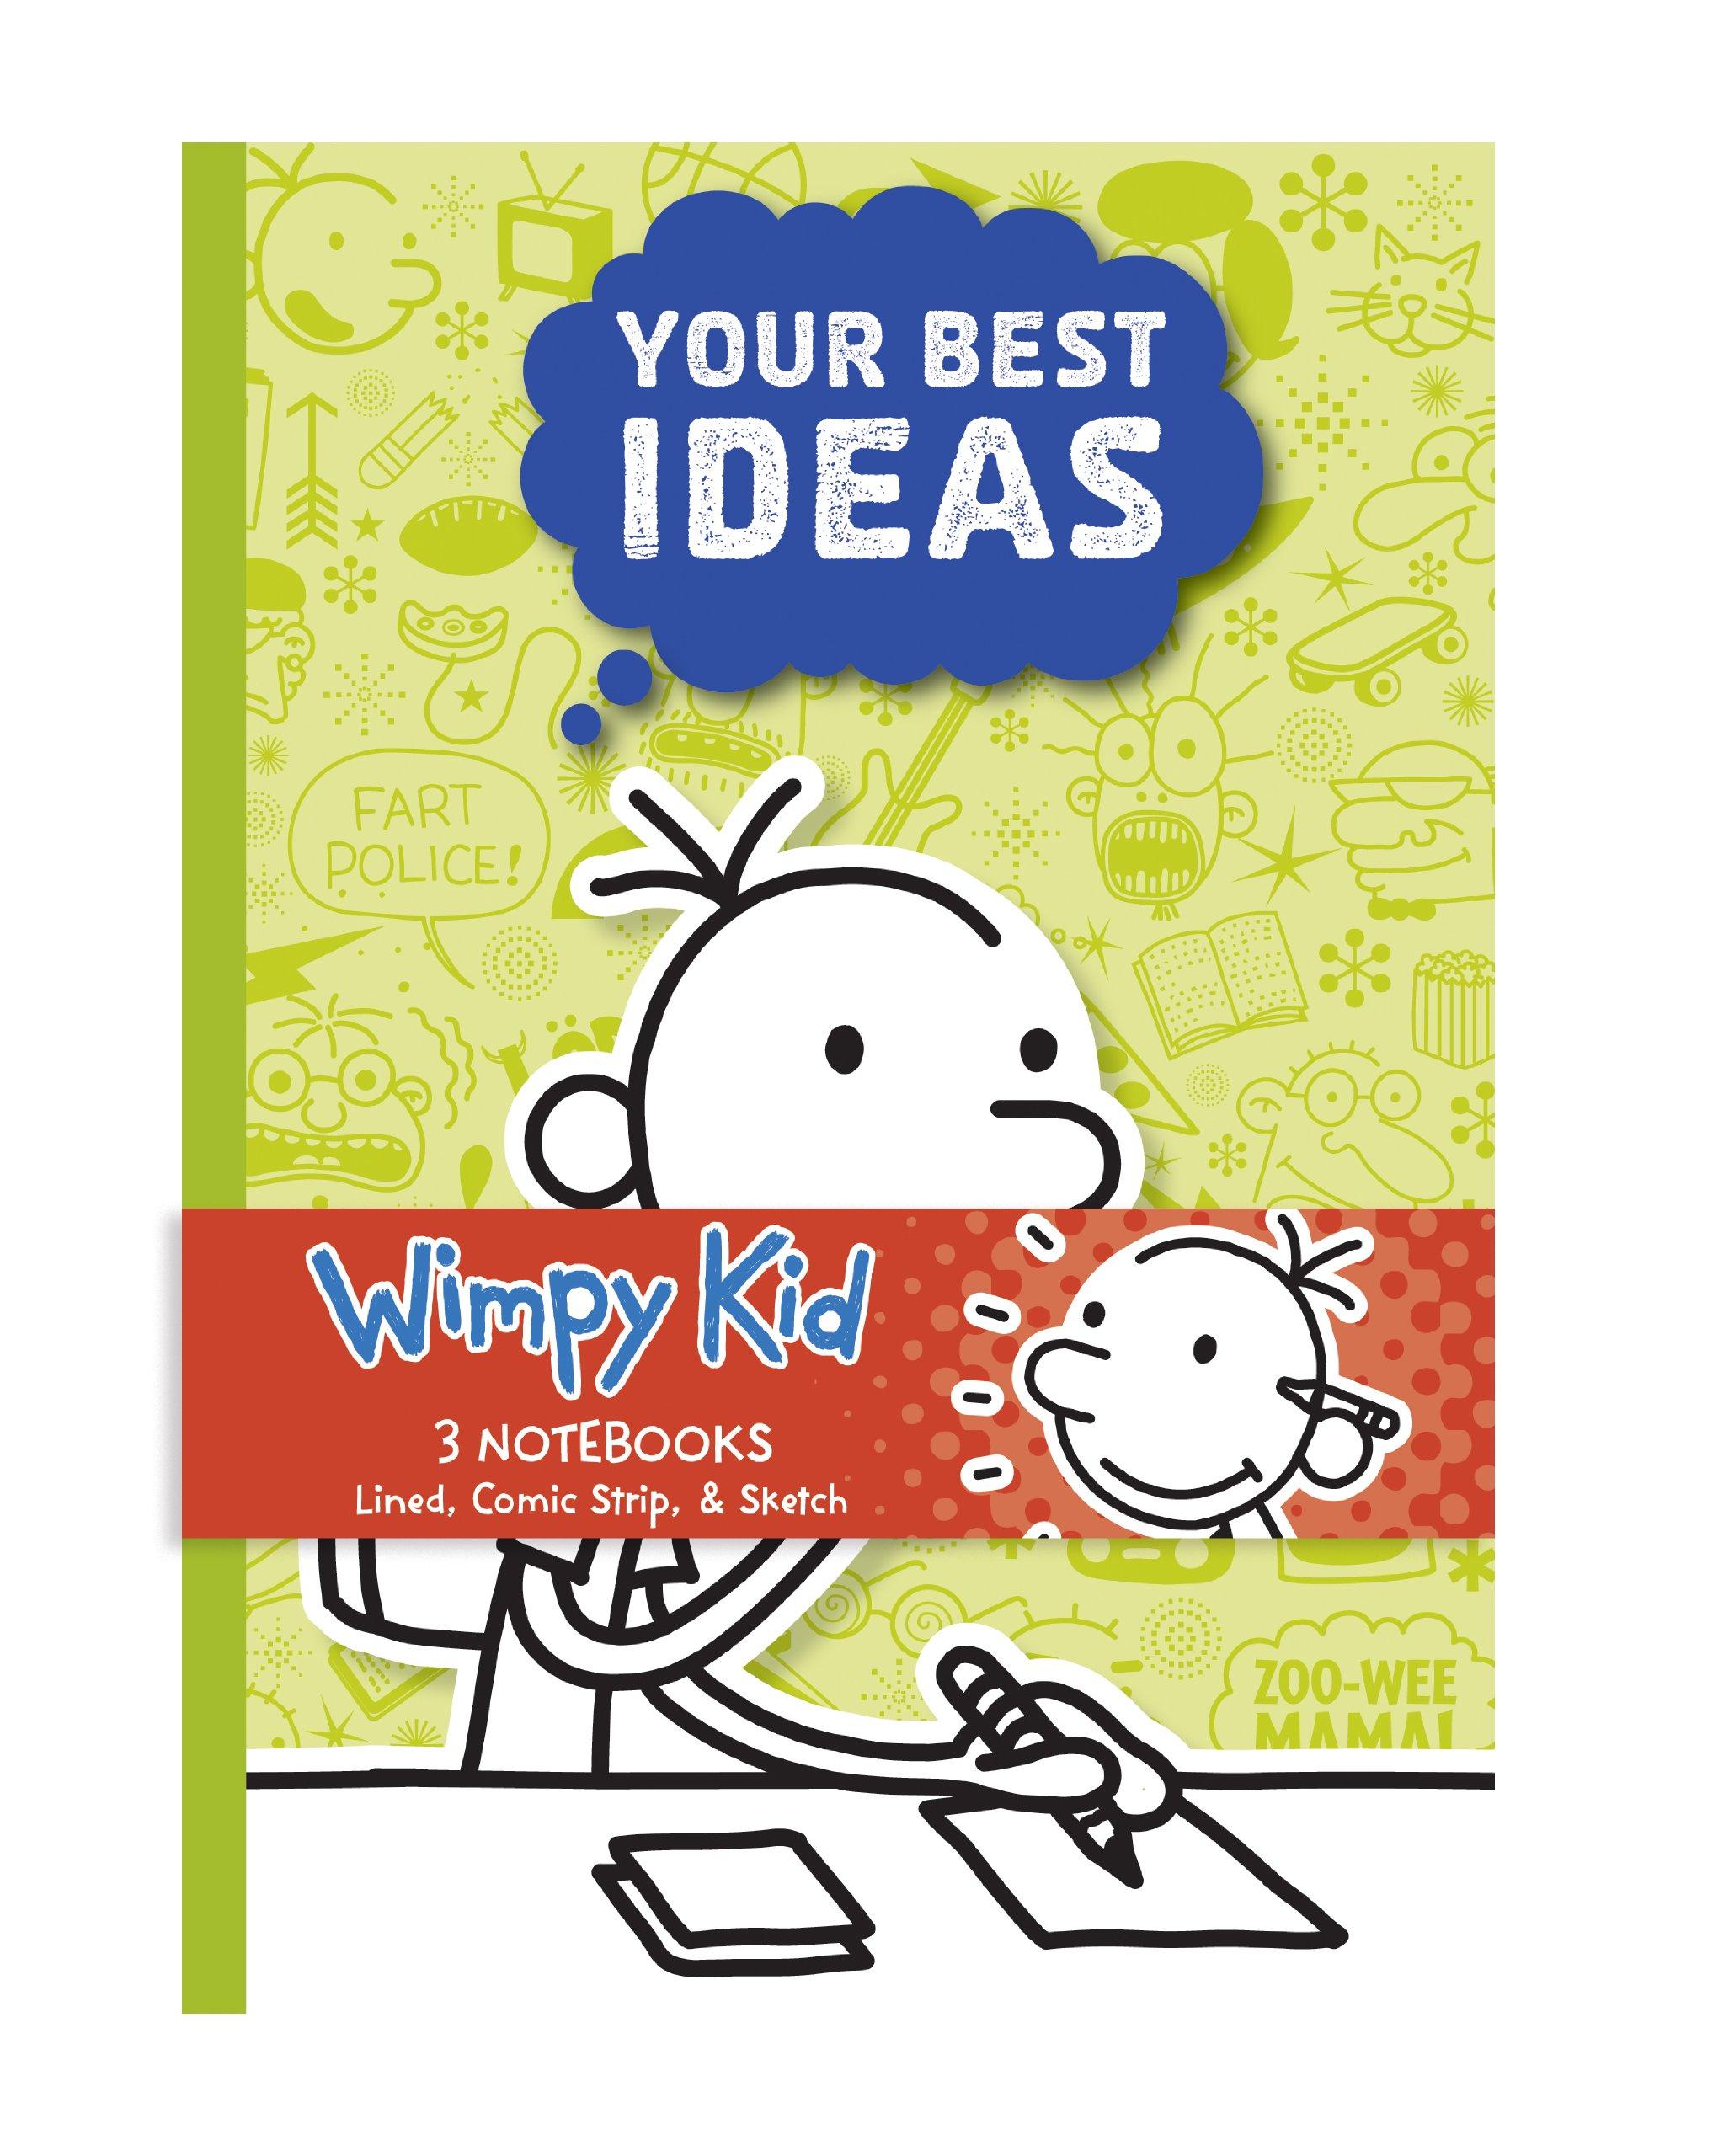 Diary of a wimpy kid 3 notebook set mudpuppy jeff kinney diary of a wimpy kid 3 notebook set mudpuppy jeff kinney 9780735338760 amazon books solutioingenieria Gallery